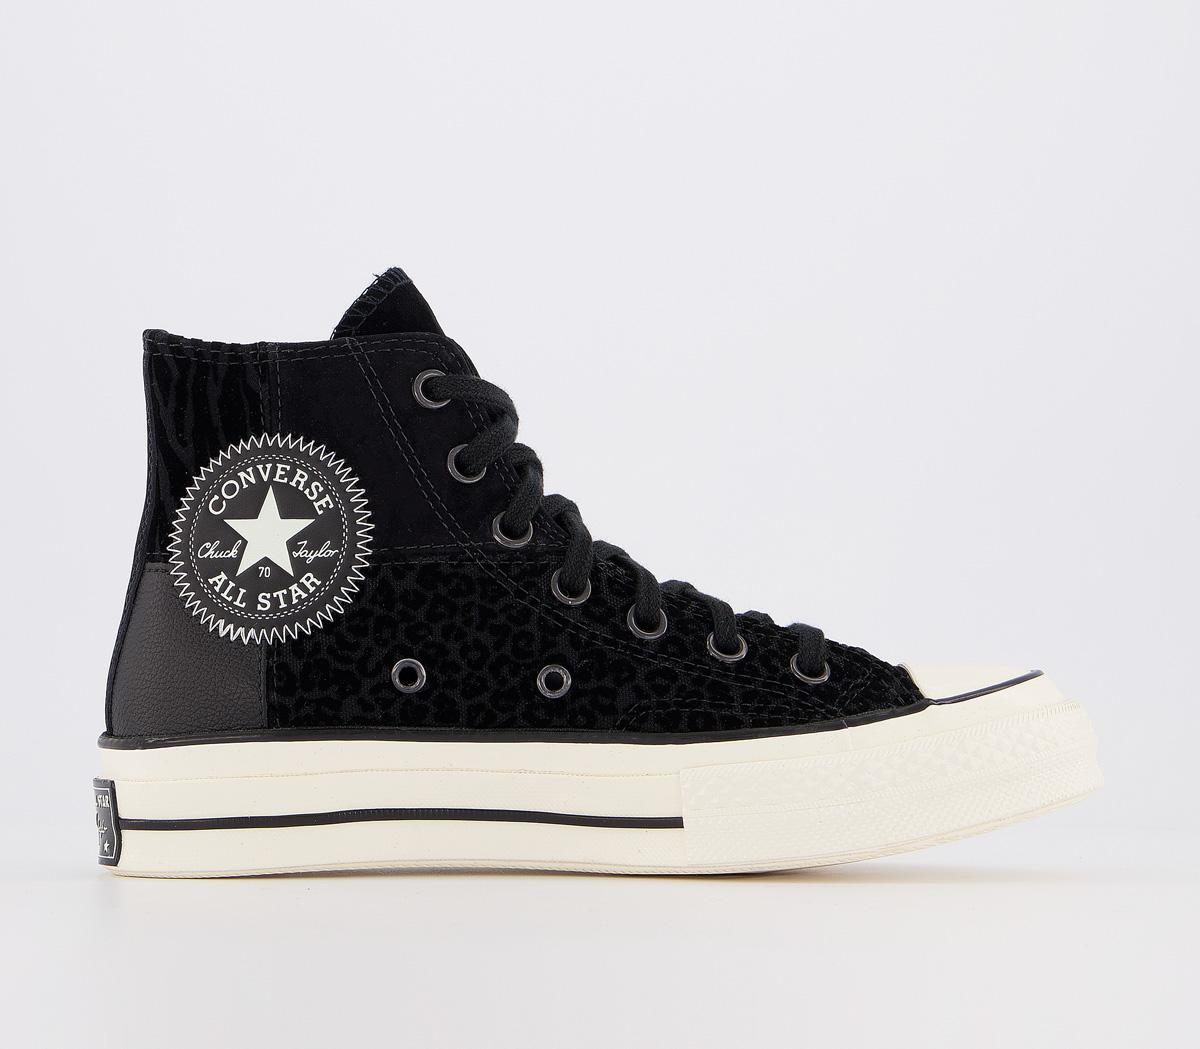 Converse All Star Hi 70s Trainers Black